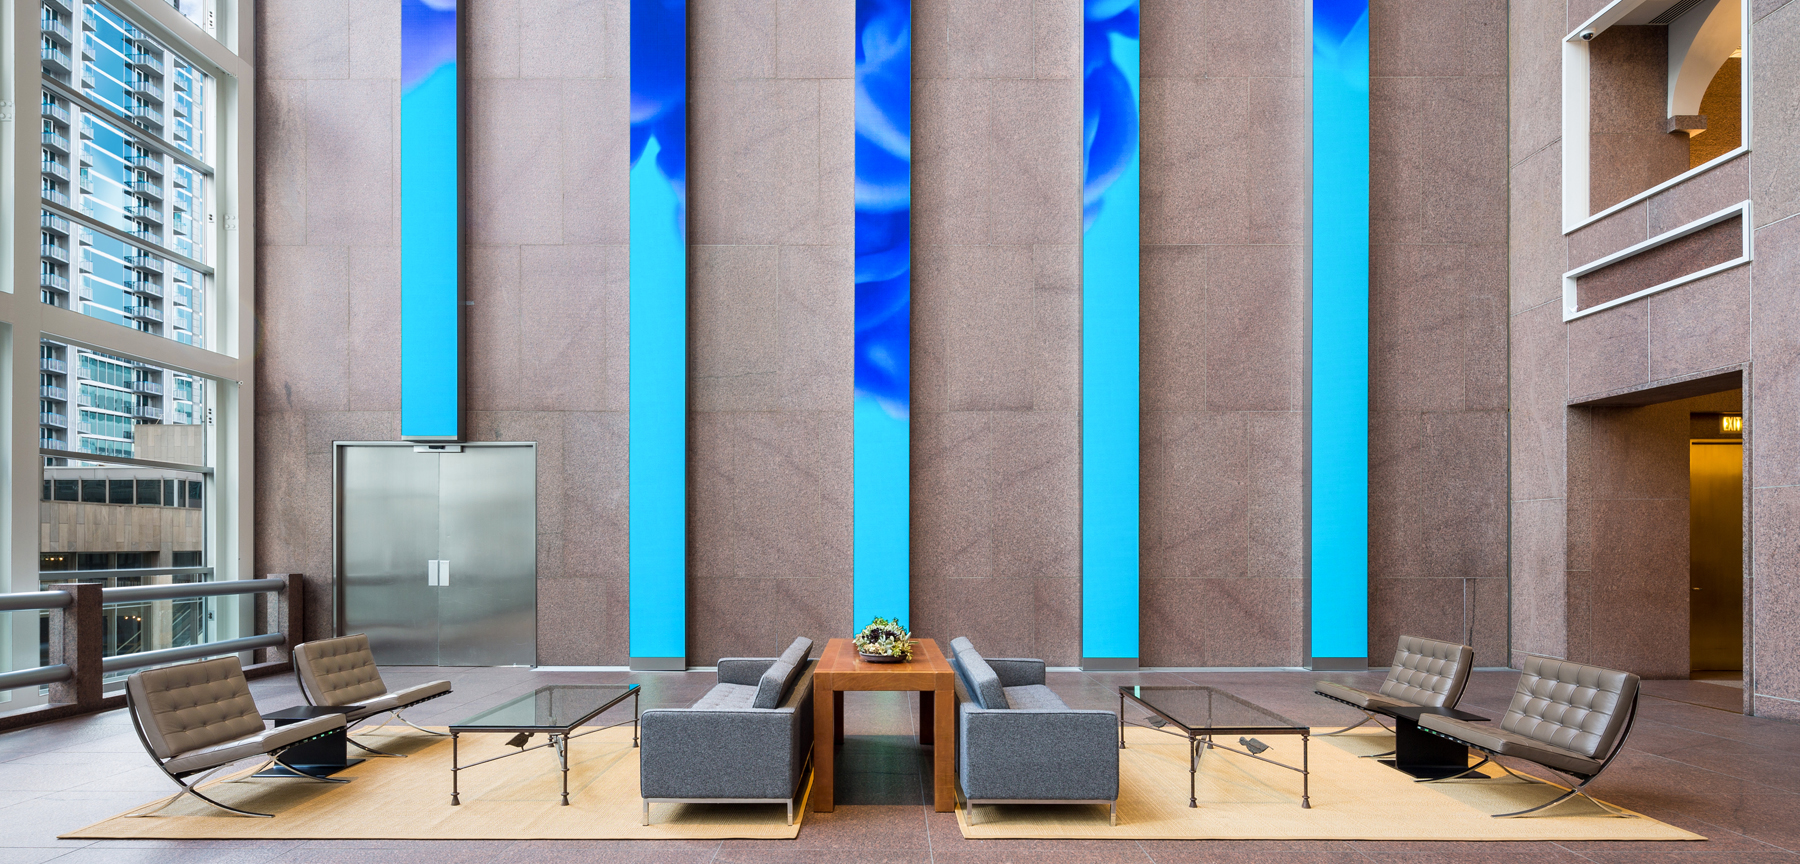 Wells Fargo lobby